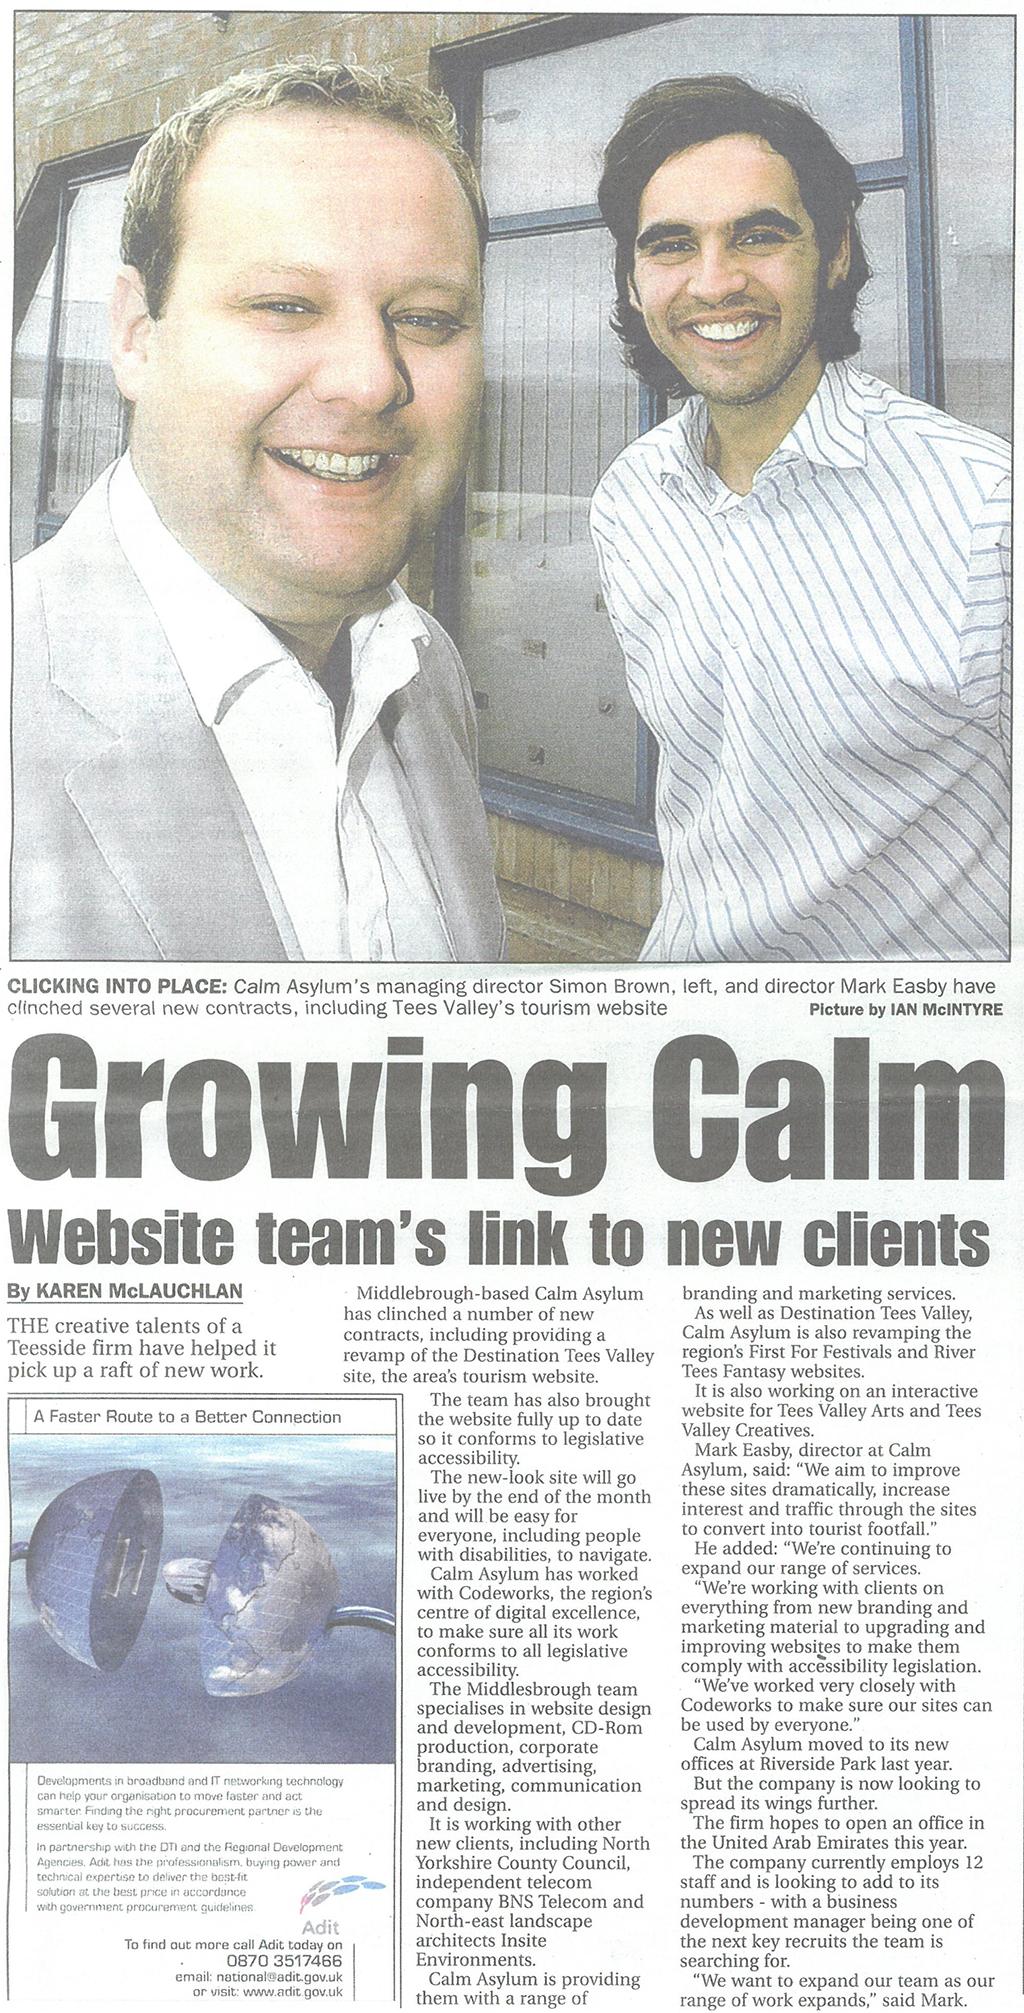 2005-08-23, Evening Gazette